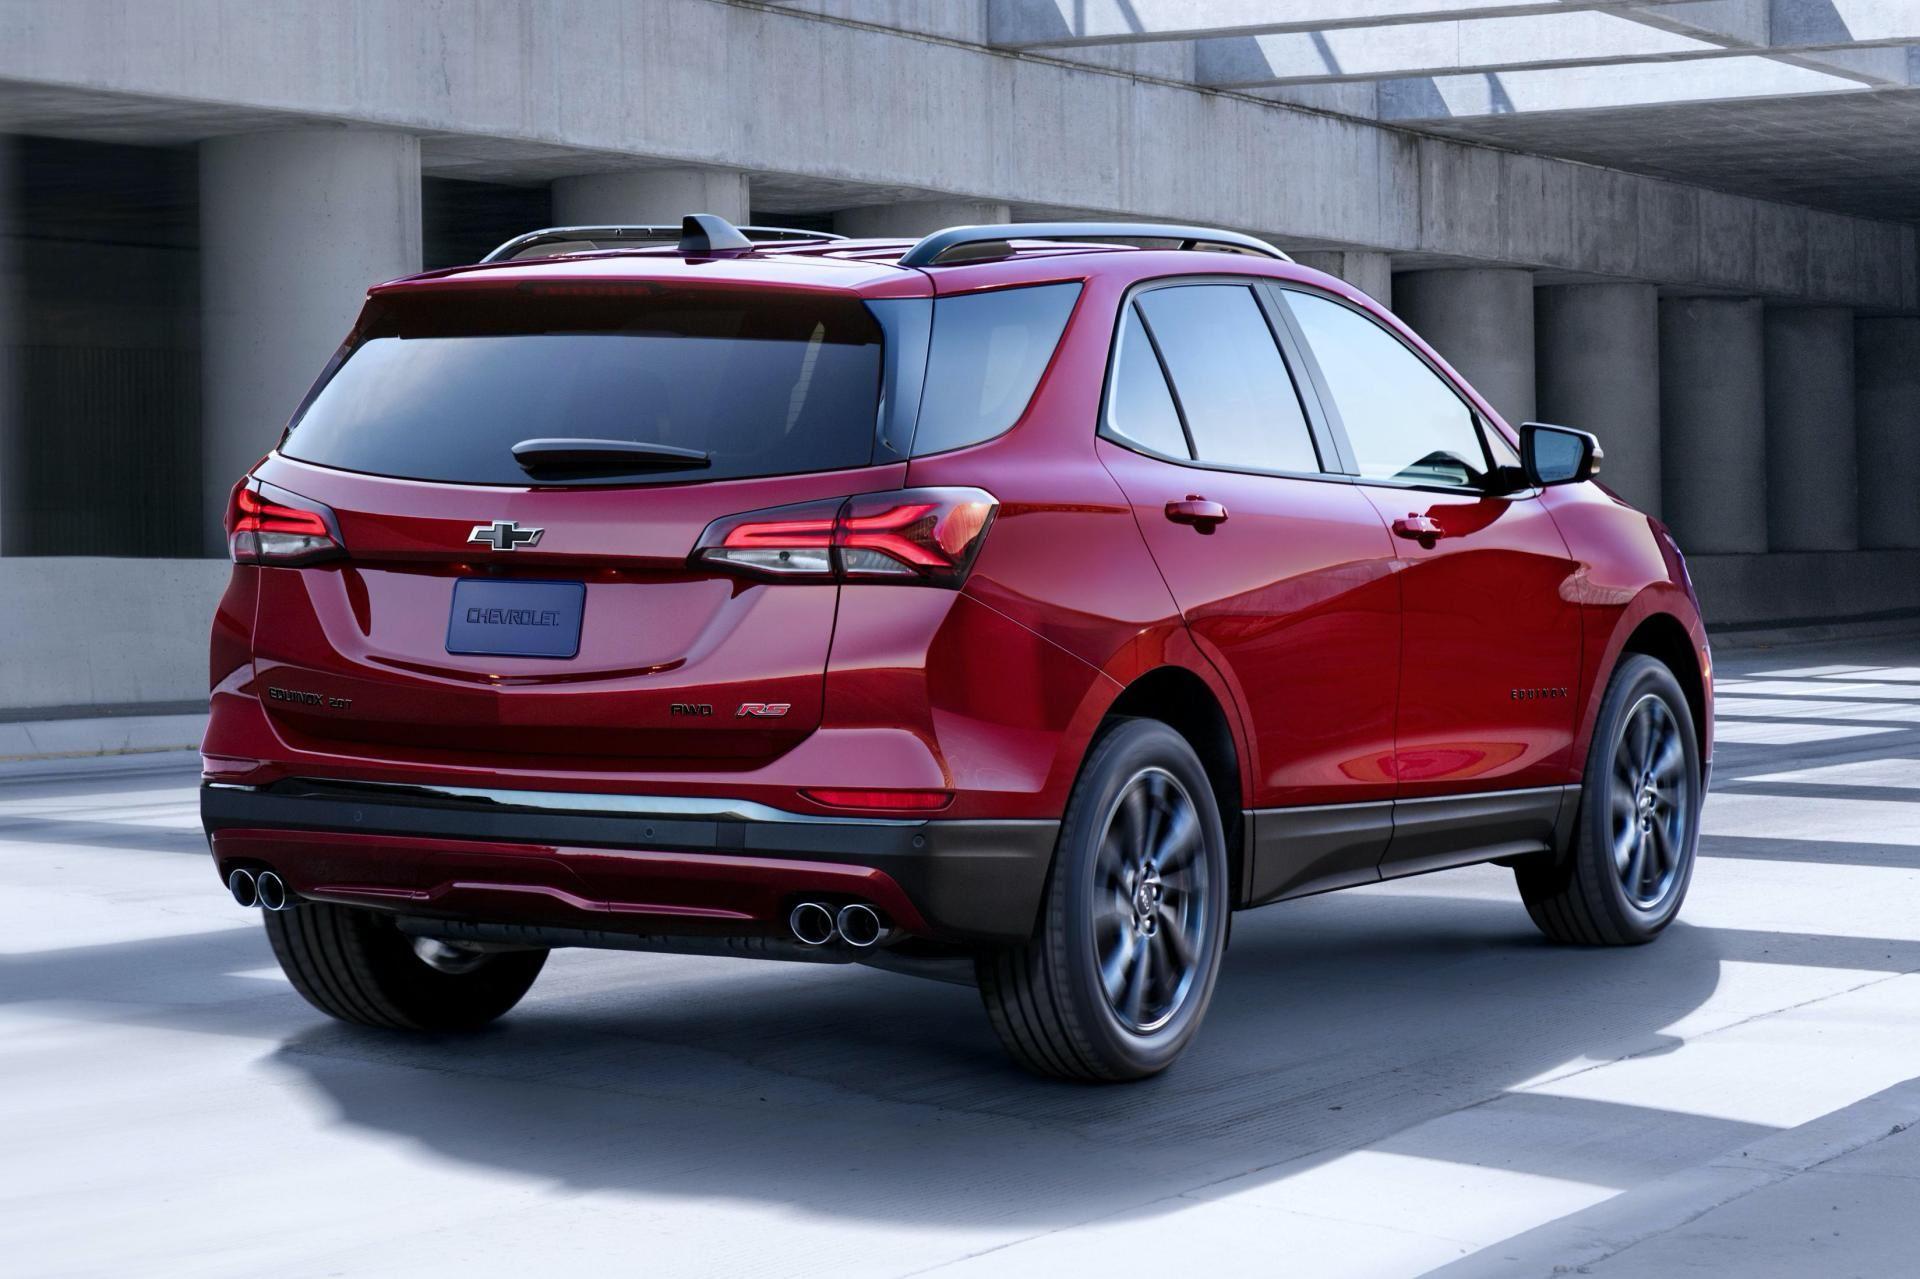 Chevrolet-Equinox-facelift-2020-3